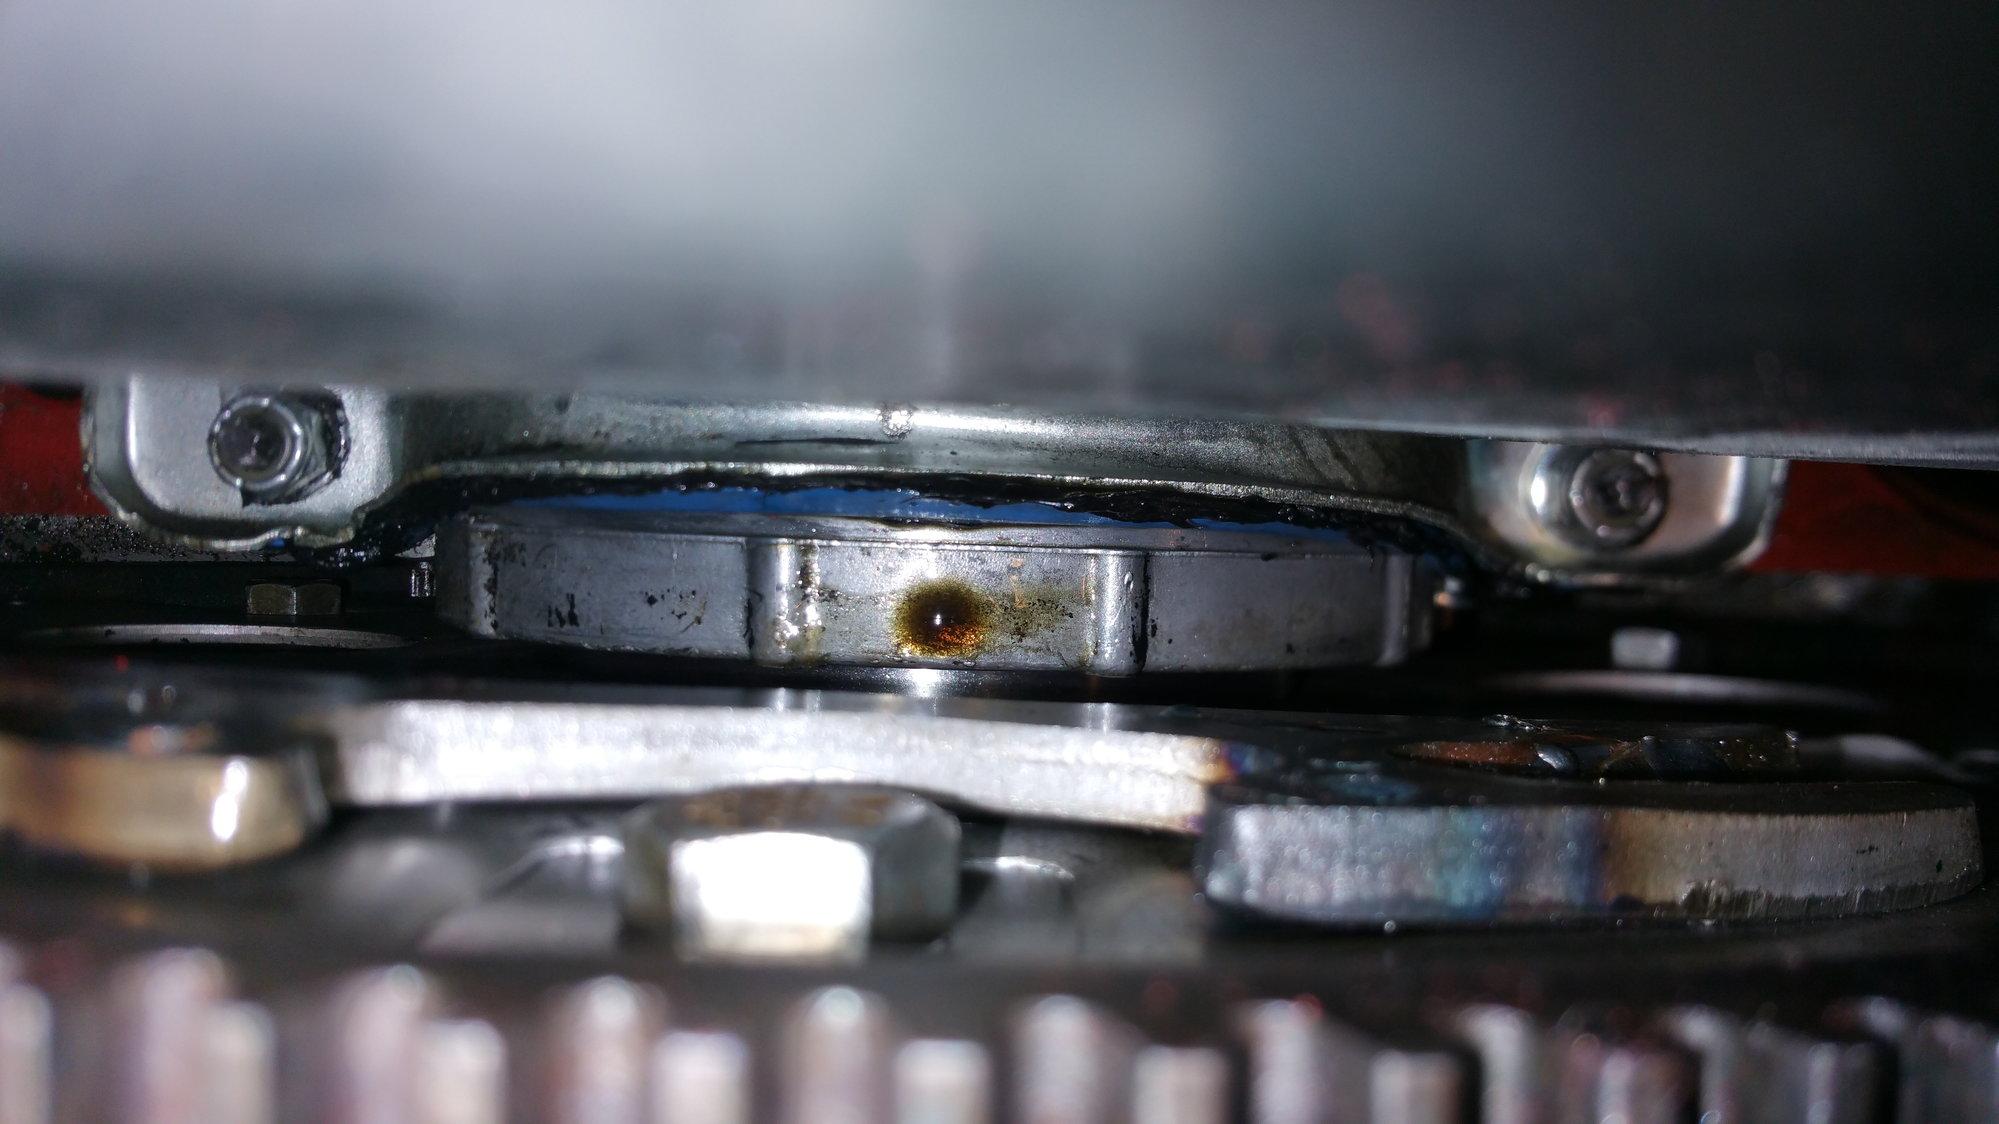 SBC One Piece Rear Main leak or remnants of oil pan leak